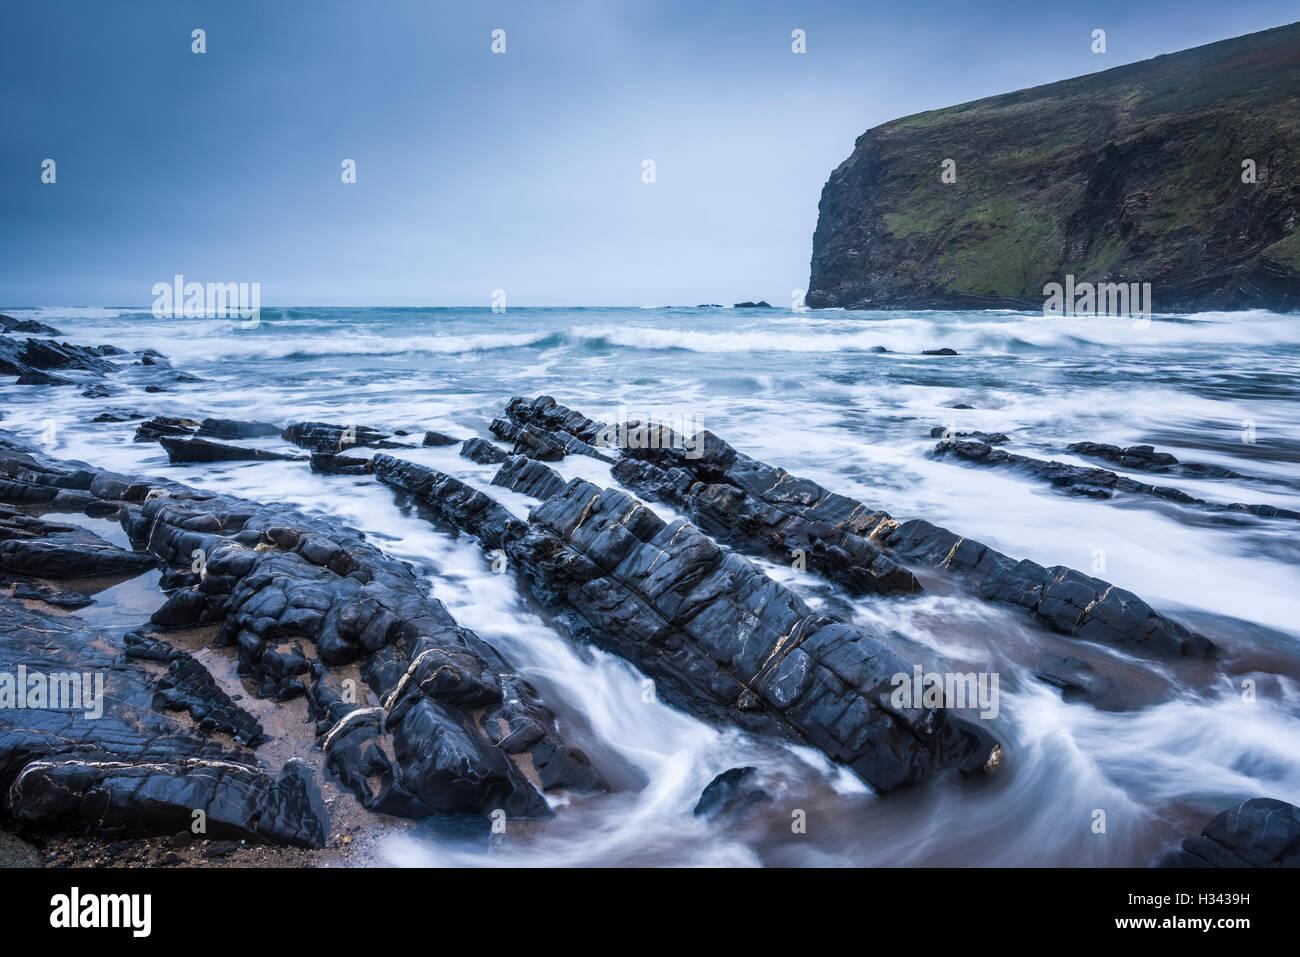 Crackington Haven beach, North Cornwall, England. - Stock Image